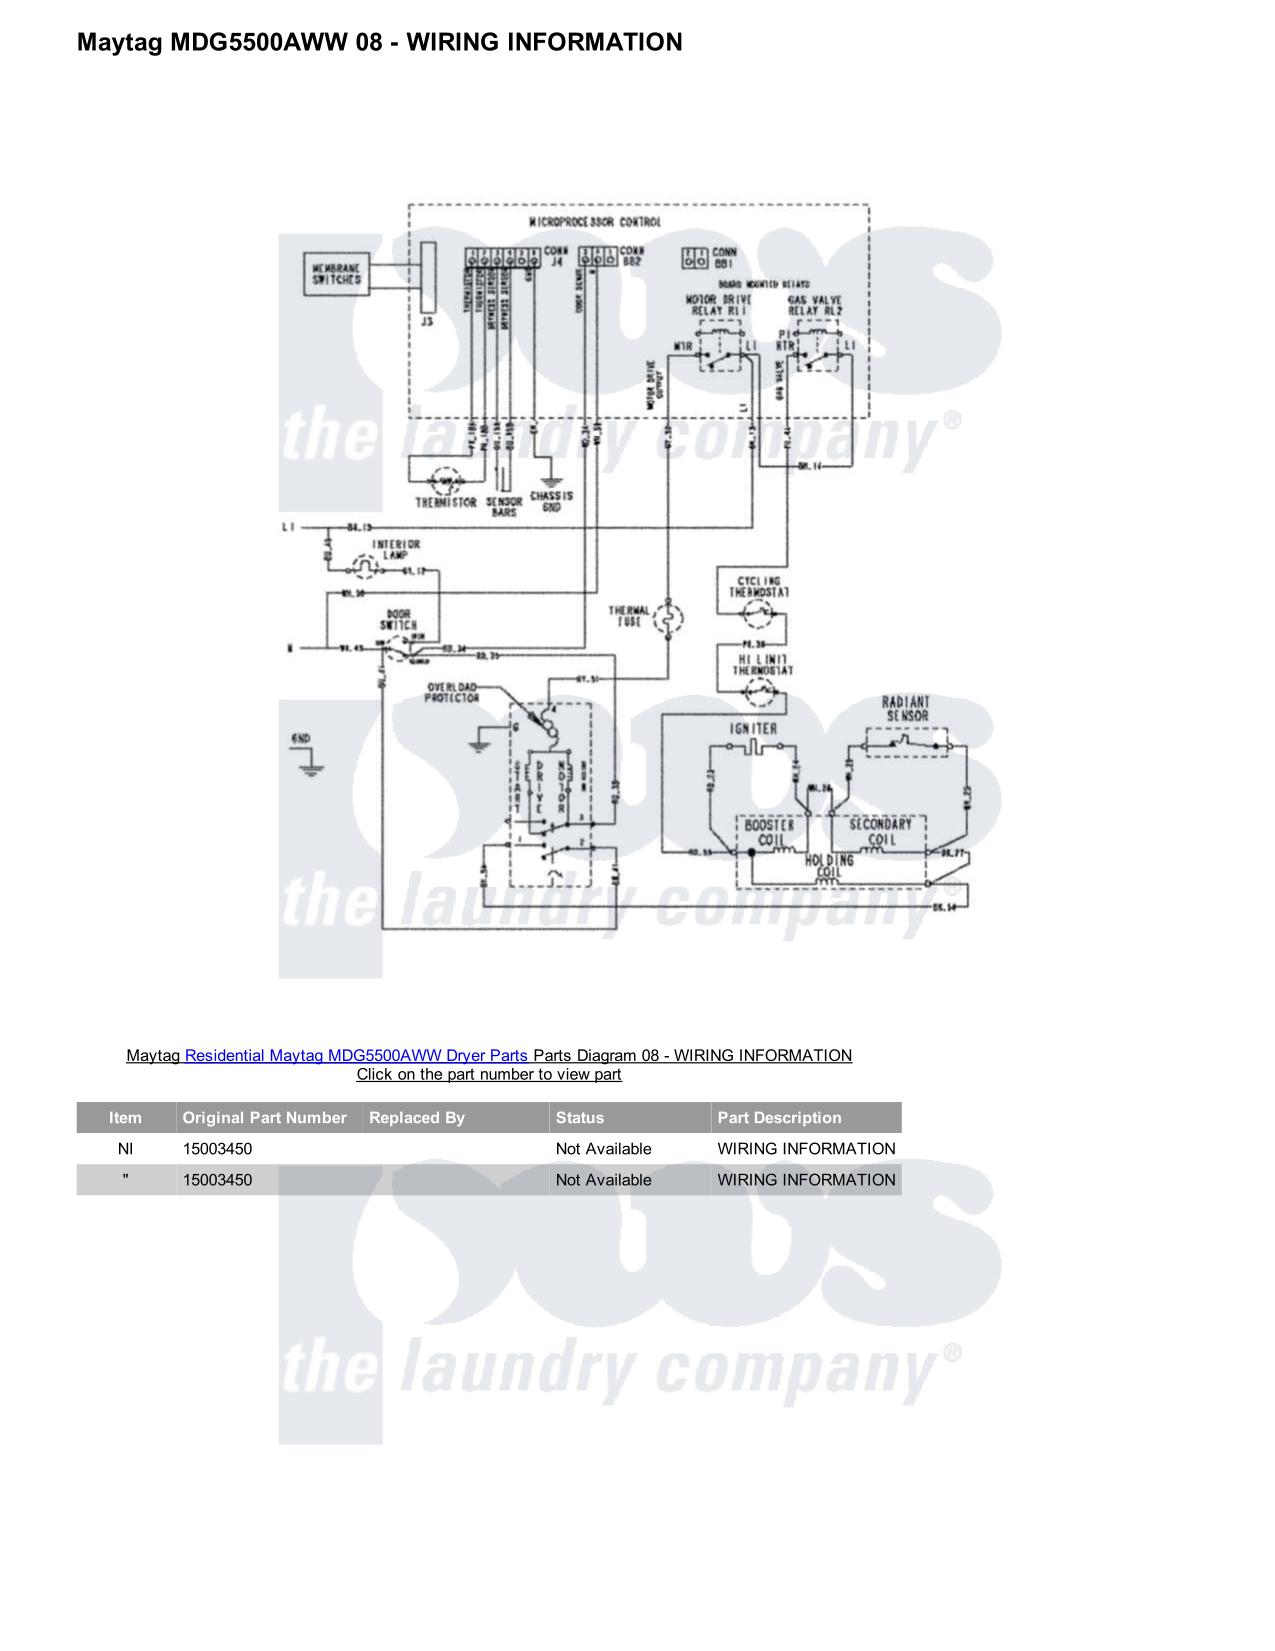 Wiring Diagram Maytag Mdg5500aww Libraries Dryer Download Free Pdf For Manualpdf Manual